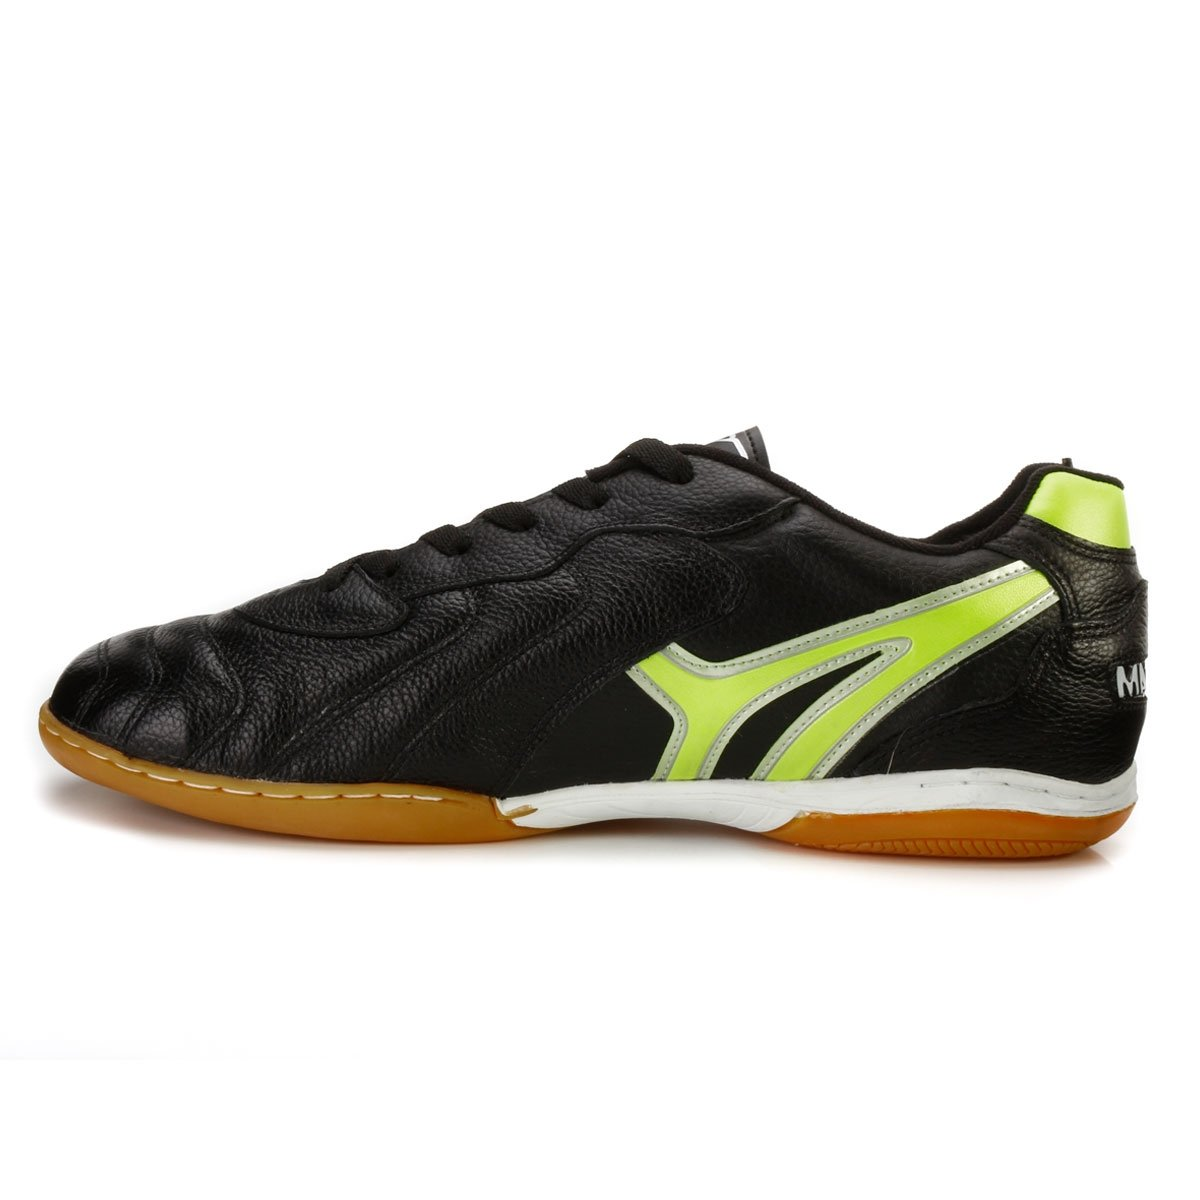 979f13fa72226 Tênis Futsal Mathaus 113.069  Tênis Futsal Mathaus 113.069 ...